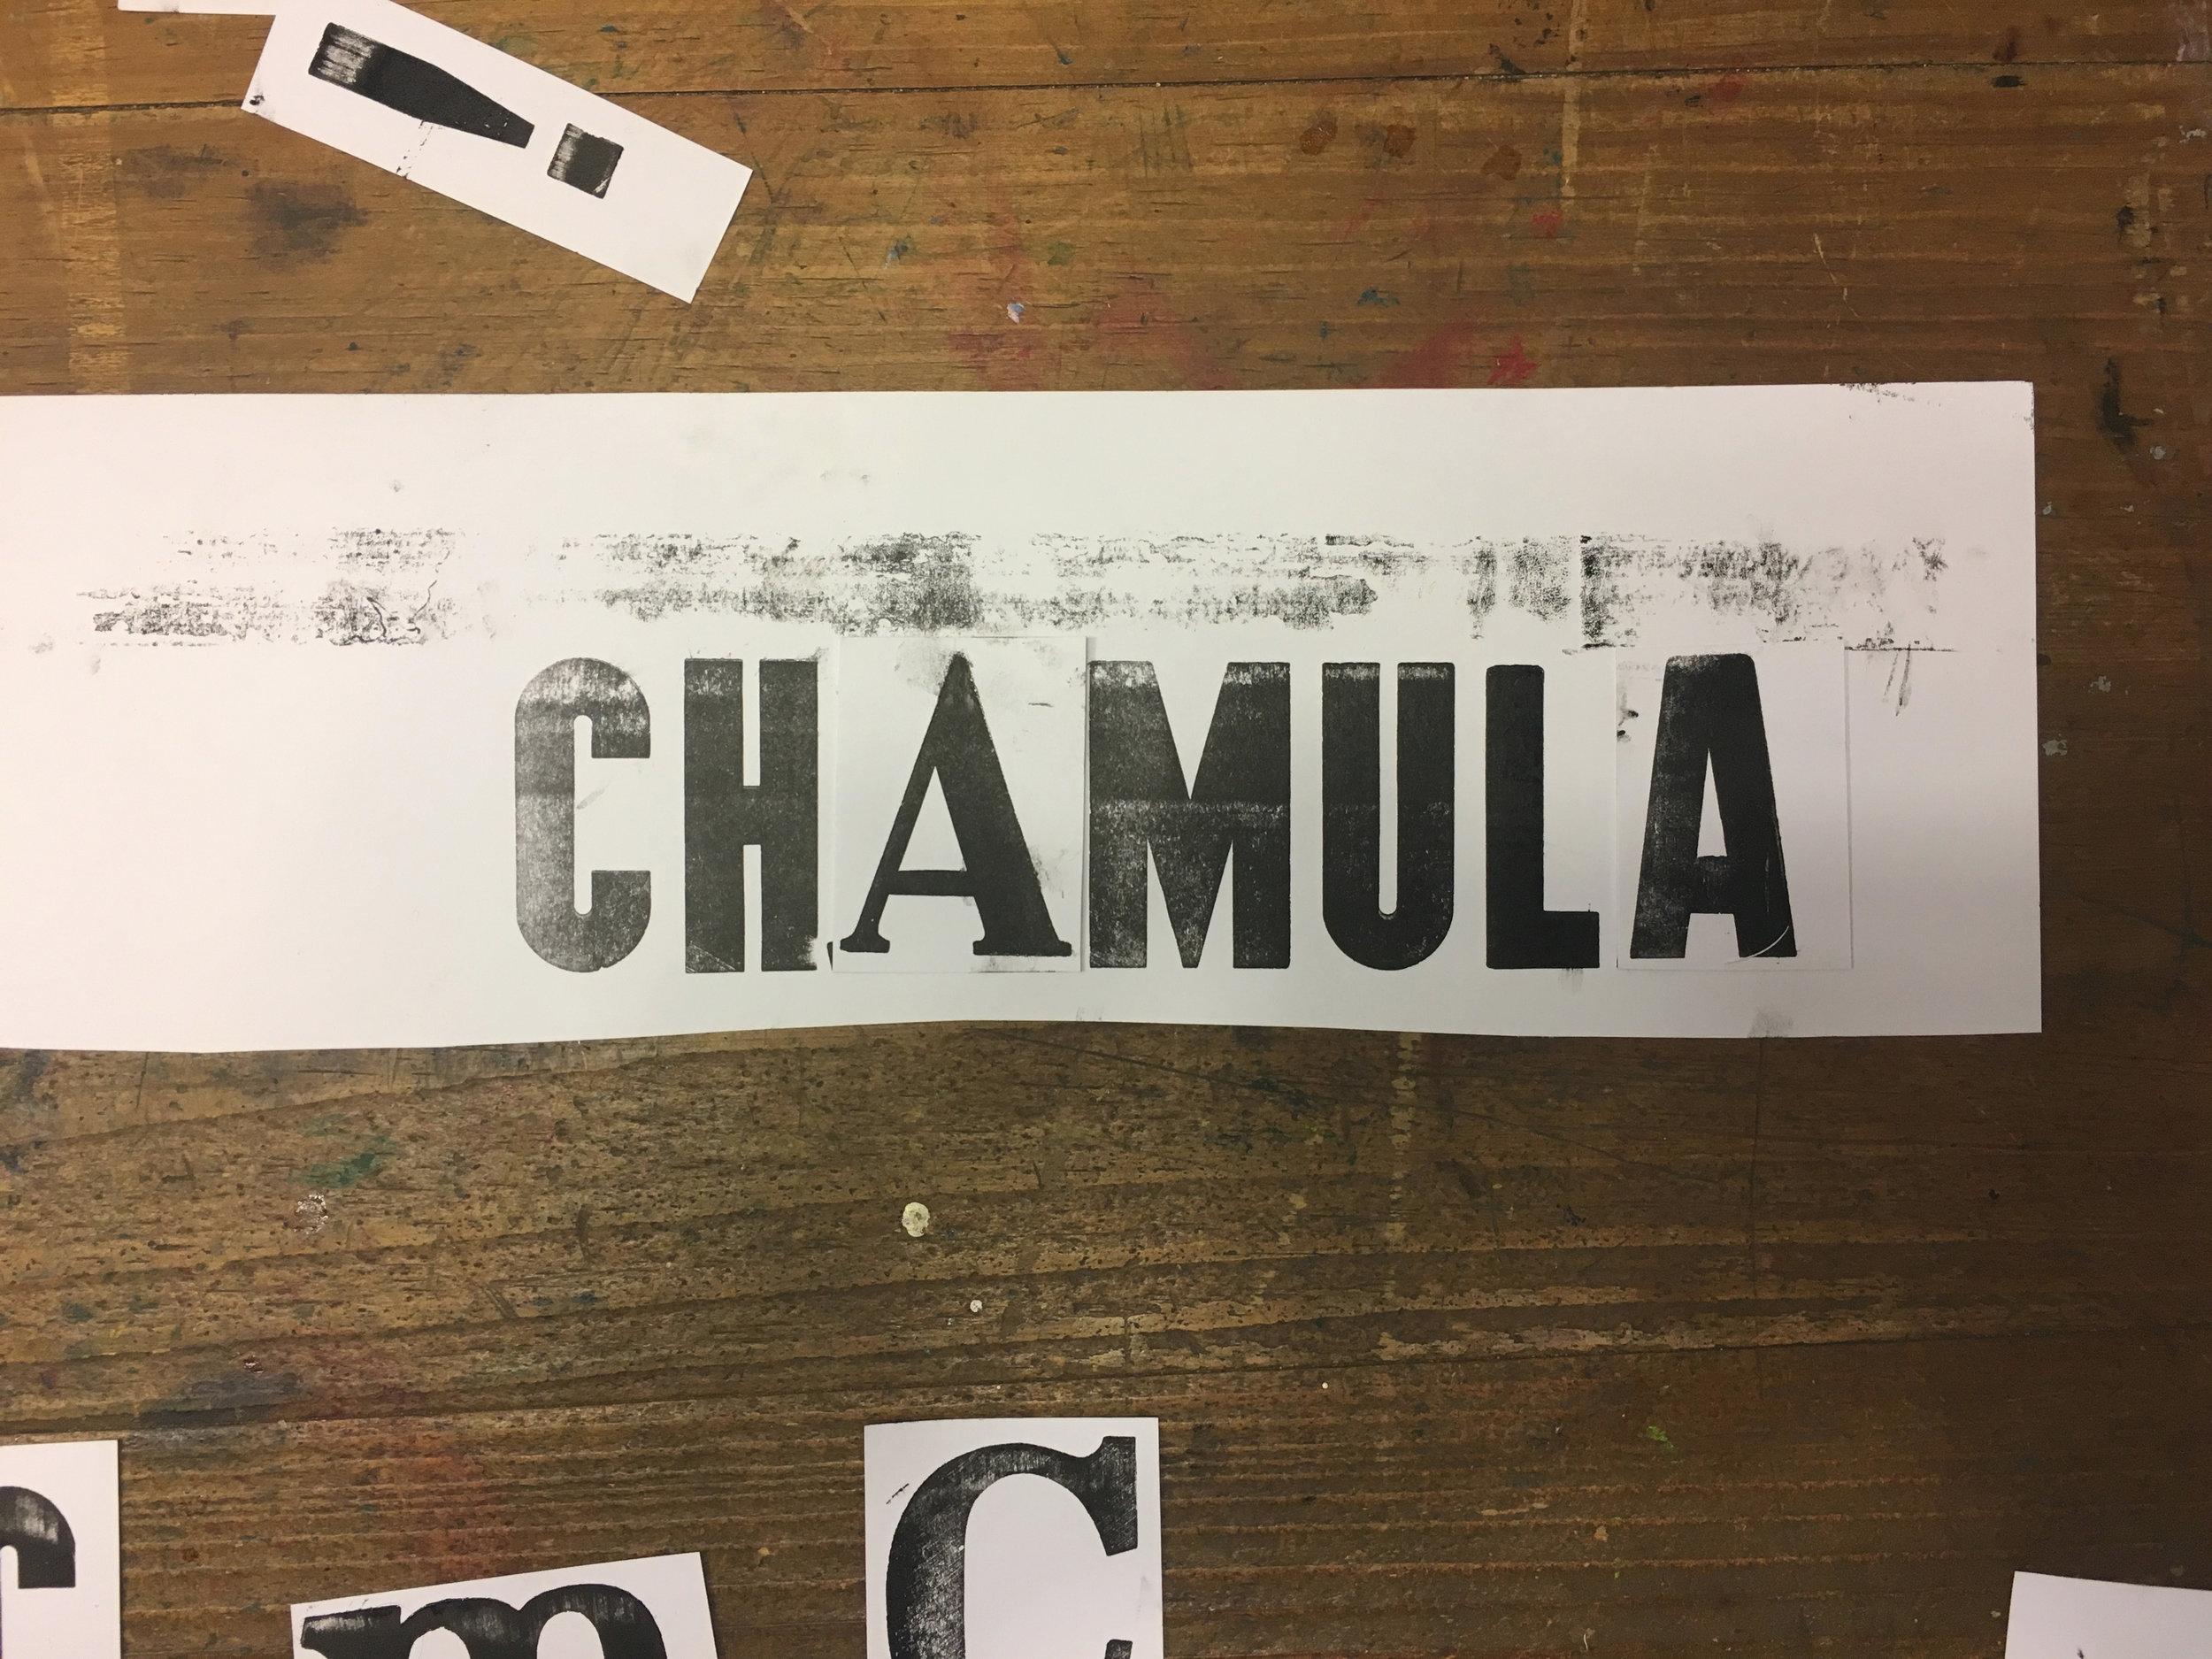 10-personalpress-taller-papel-principal-letterpress-imprenta-tipografica-1.jpg